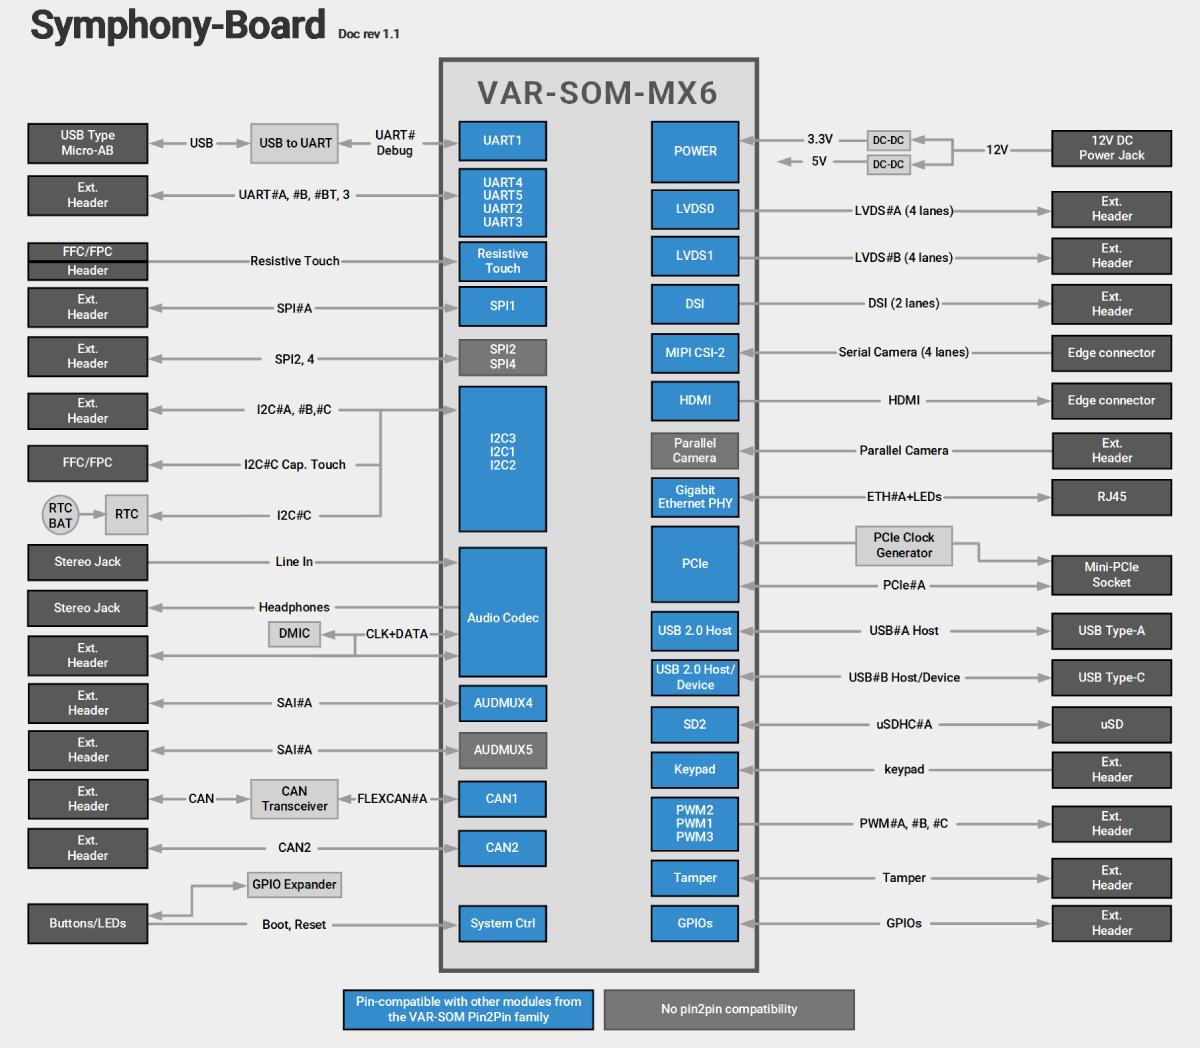 Symphony-Board With VAR-SOM-MX6 Block Diagram Diagram